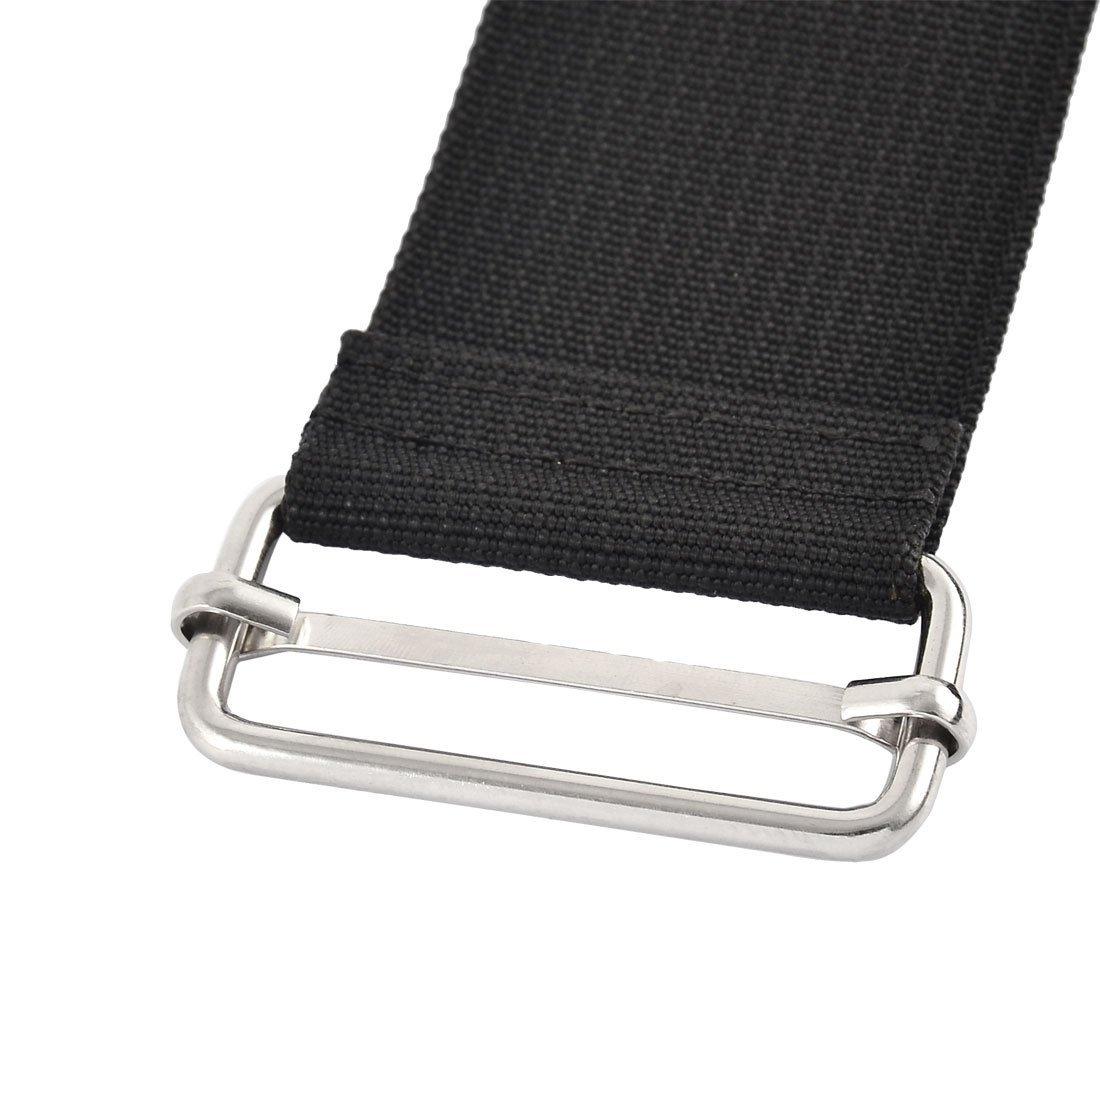 EbuyChX Naylon sa bahay Travel Adjustable Suitcase Bagahe strap belt buckle 2.5M Haba ng Black